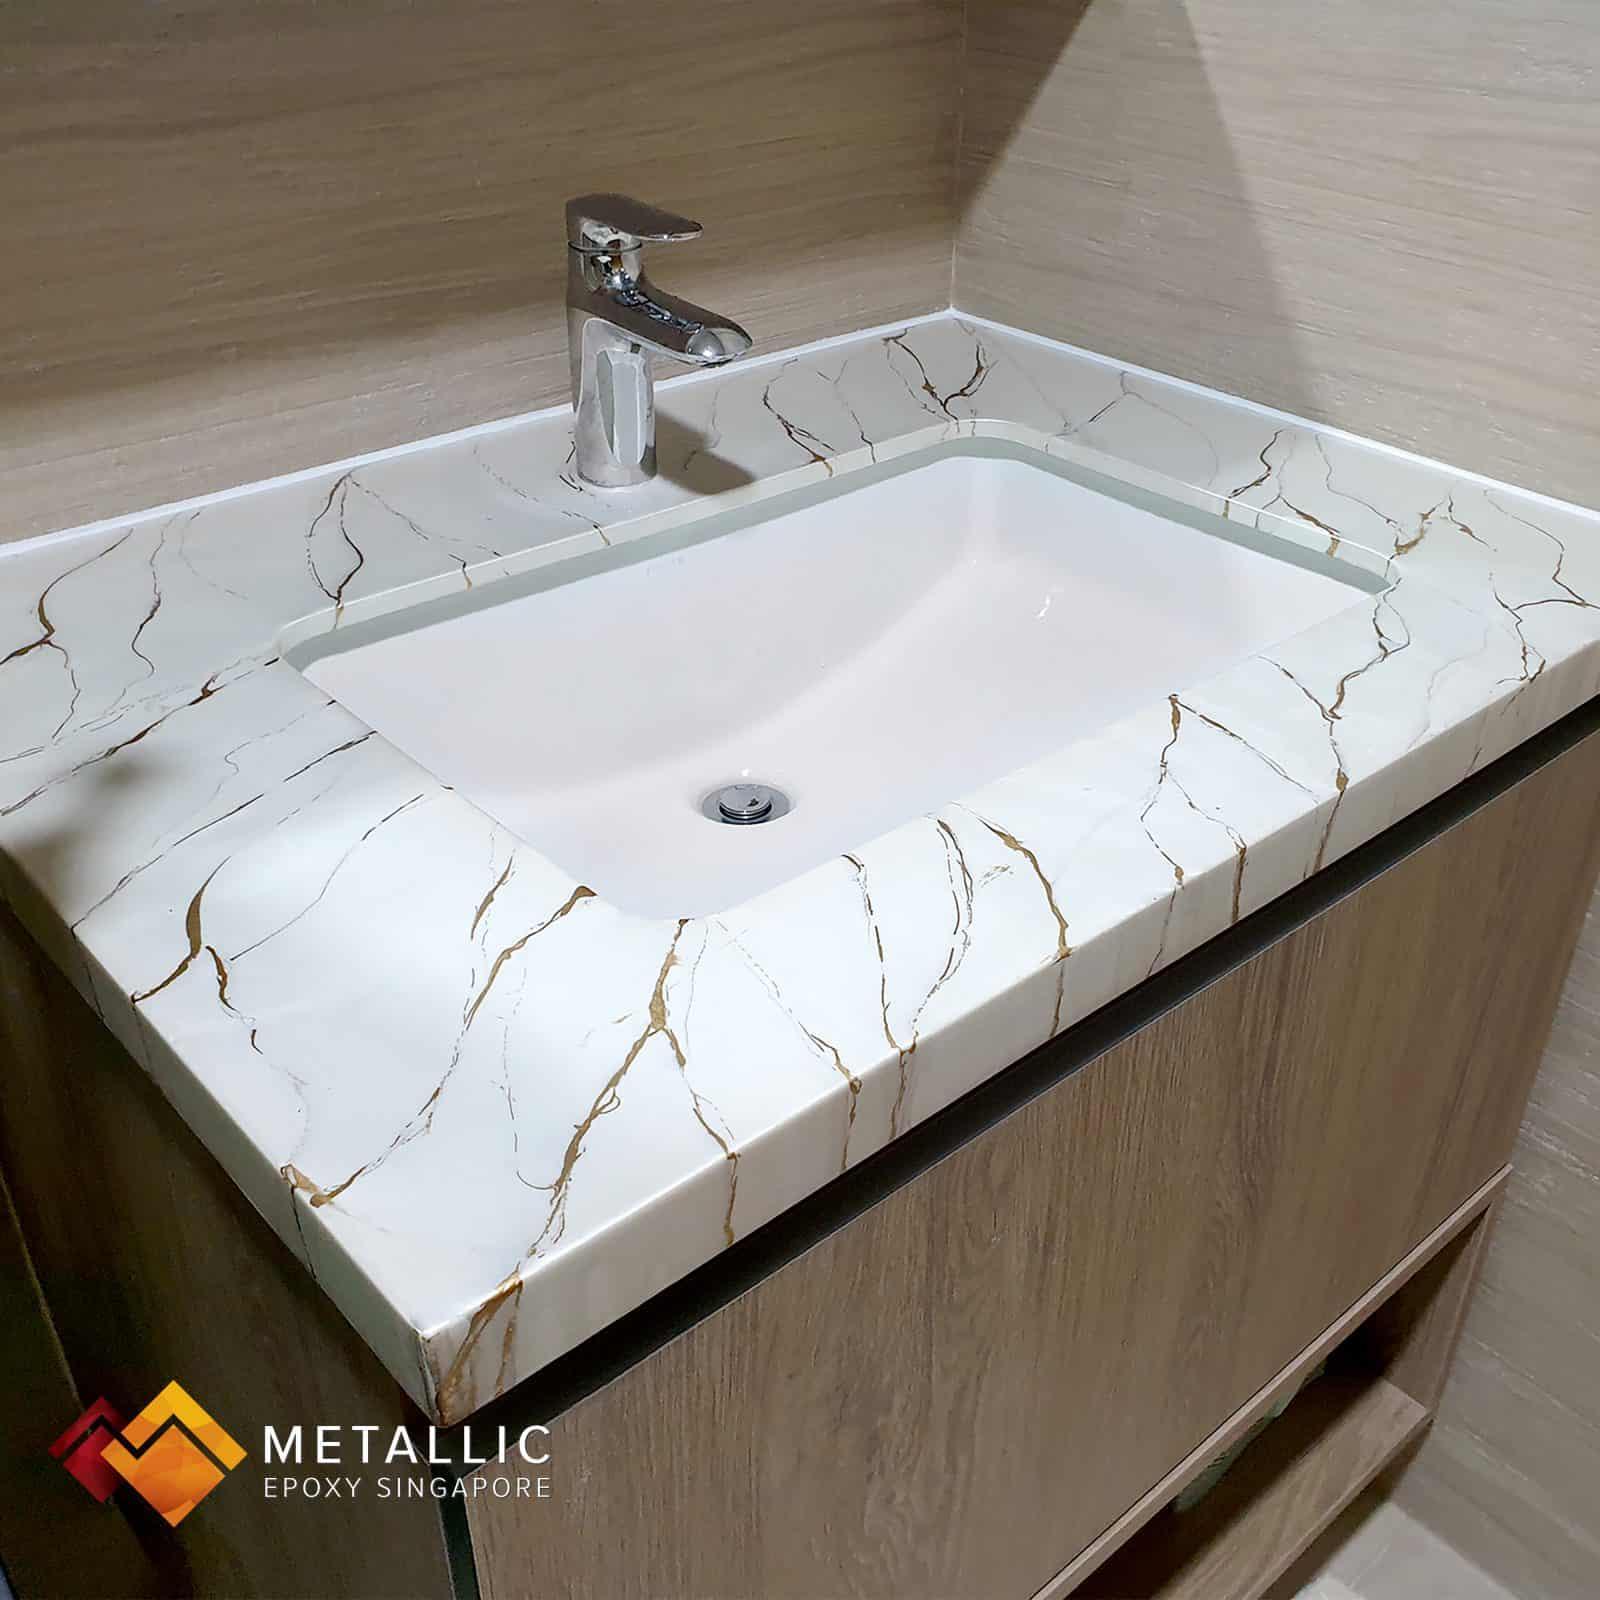 white metallic epoxy singapore vanity top